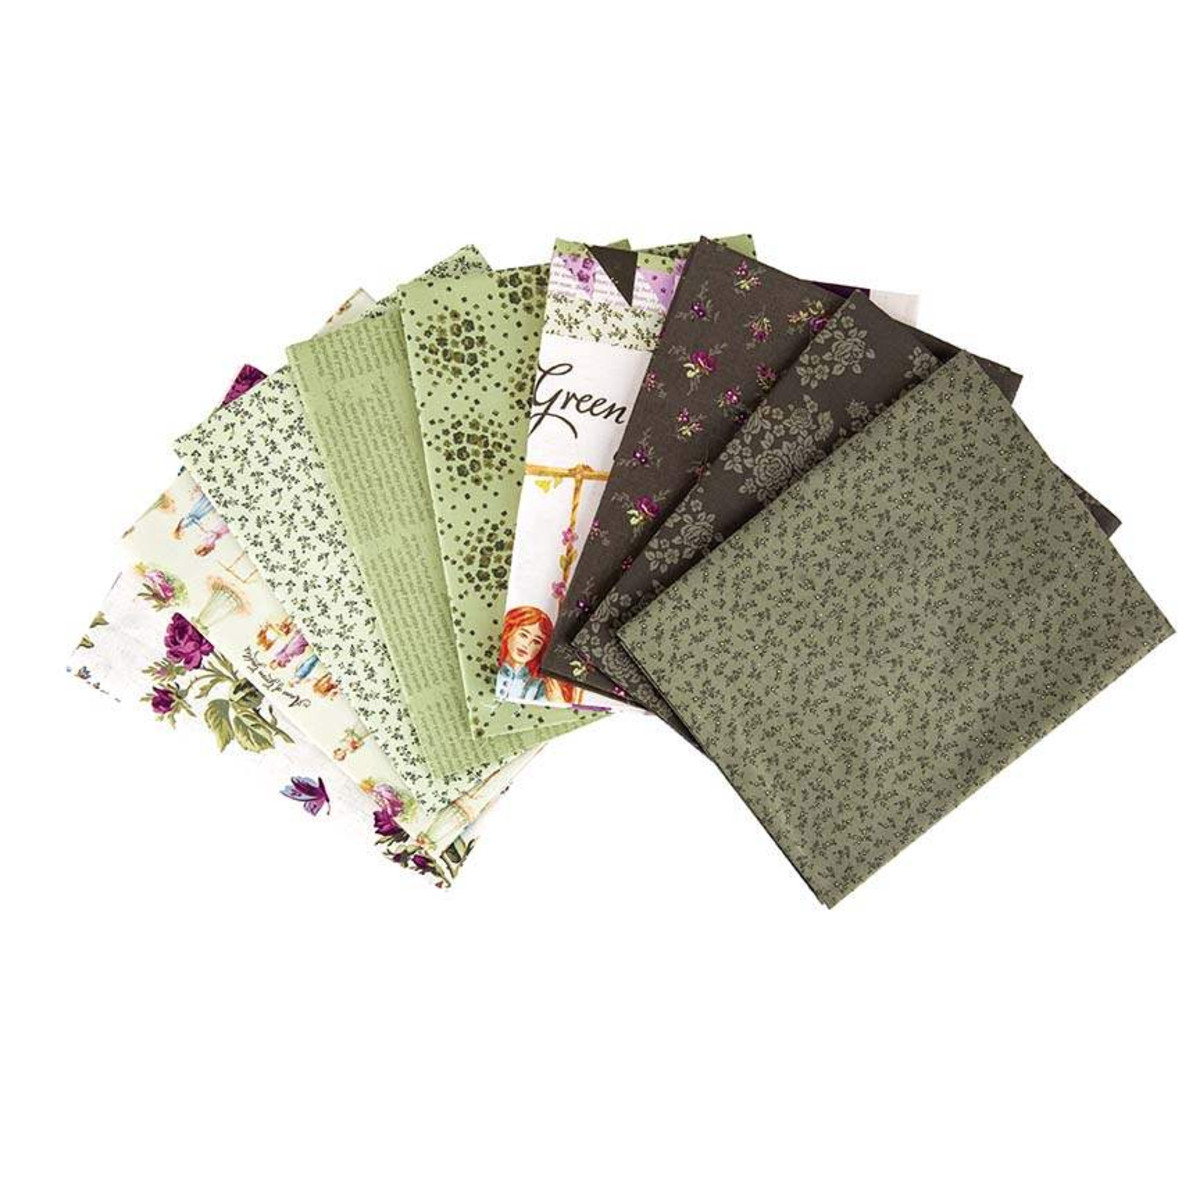 Riley Blake One Yard Bundle - Anne of Green Gables Parchment